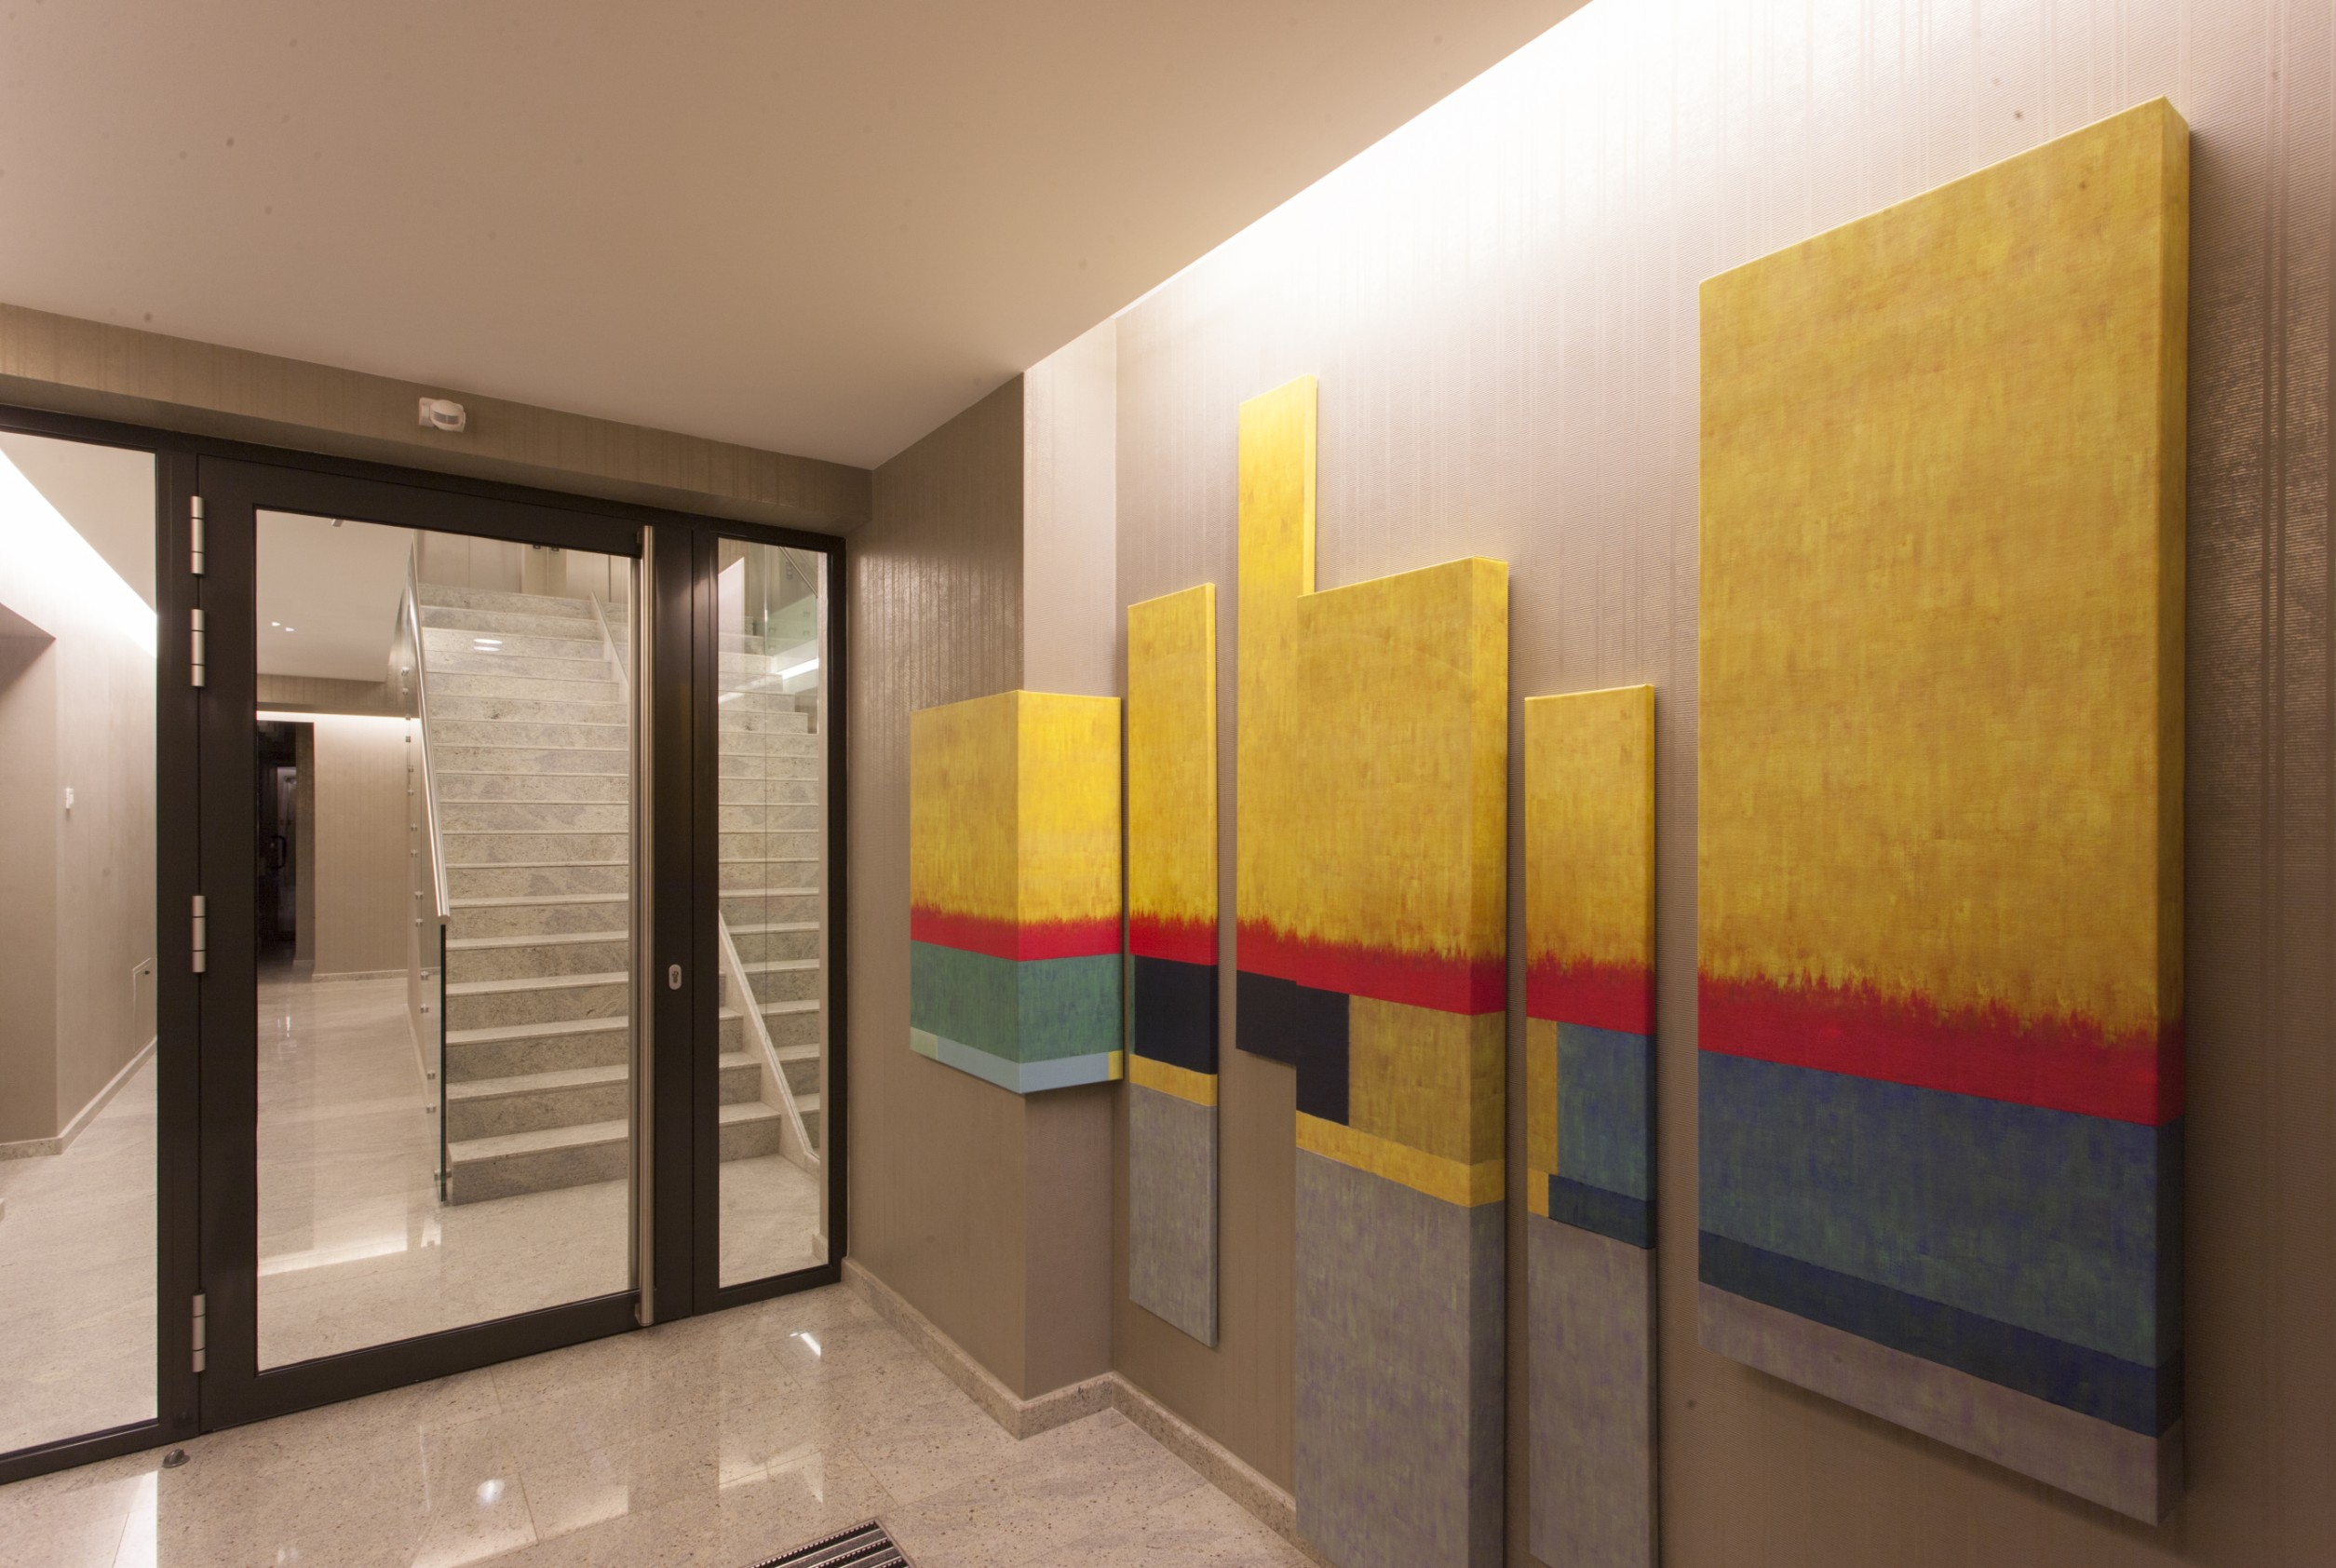 https://nbc-arhitect.ro/wp-content/uploads/2020/10/NBC-Arhitect-_-Petofi-Sandor-_-Housing-_-interior-design_entrance.jpg